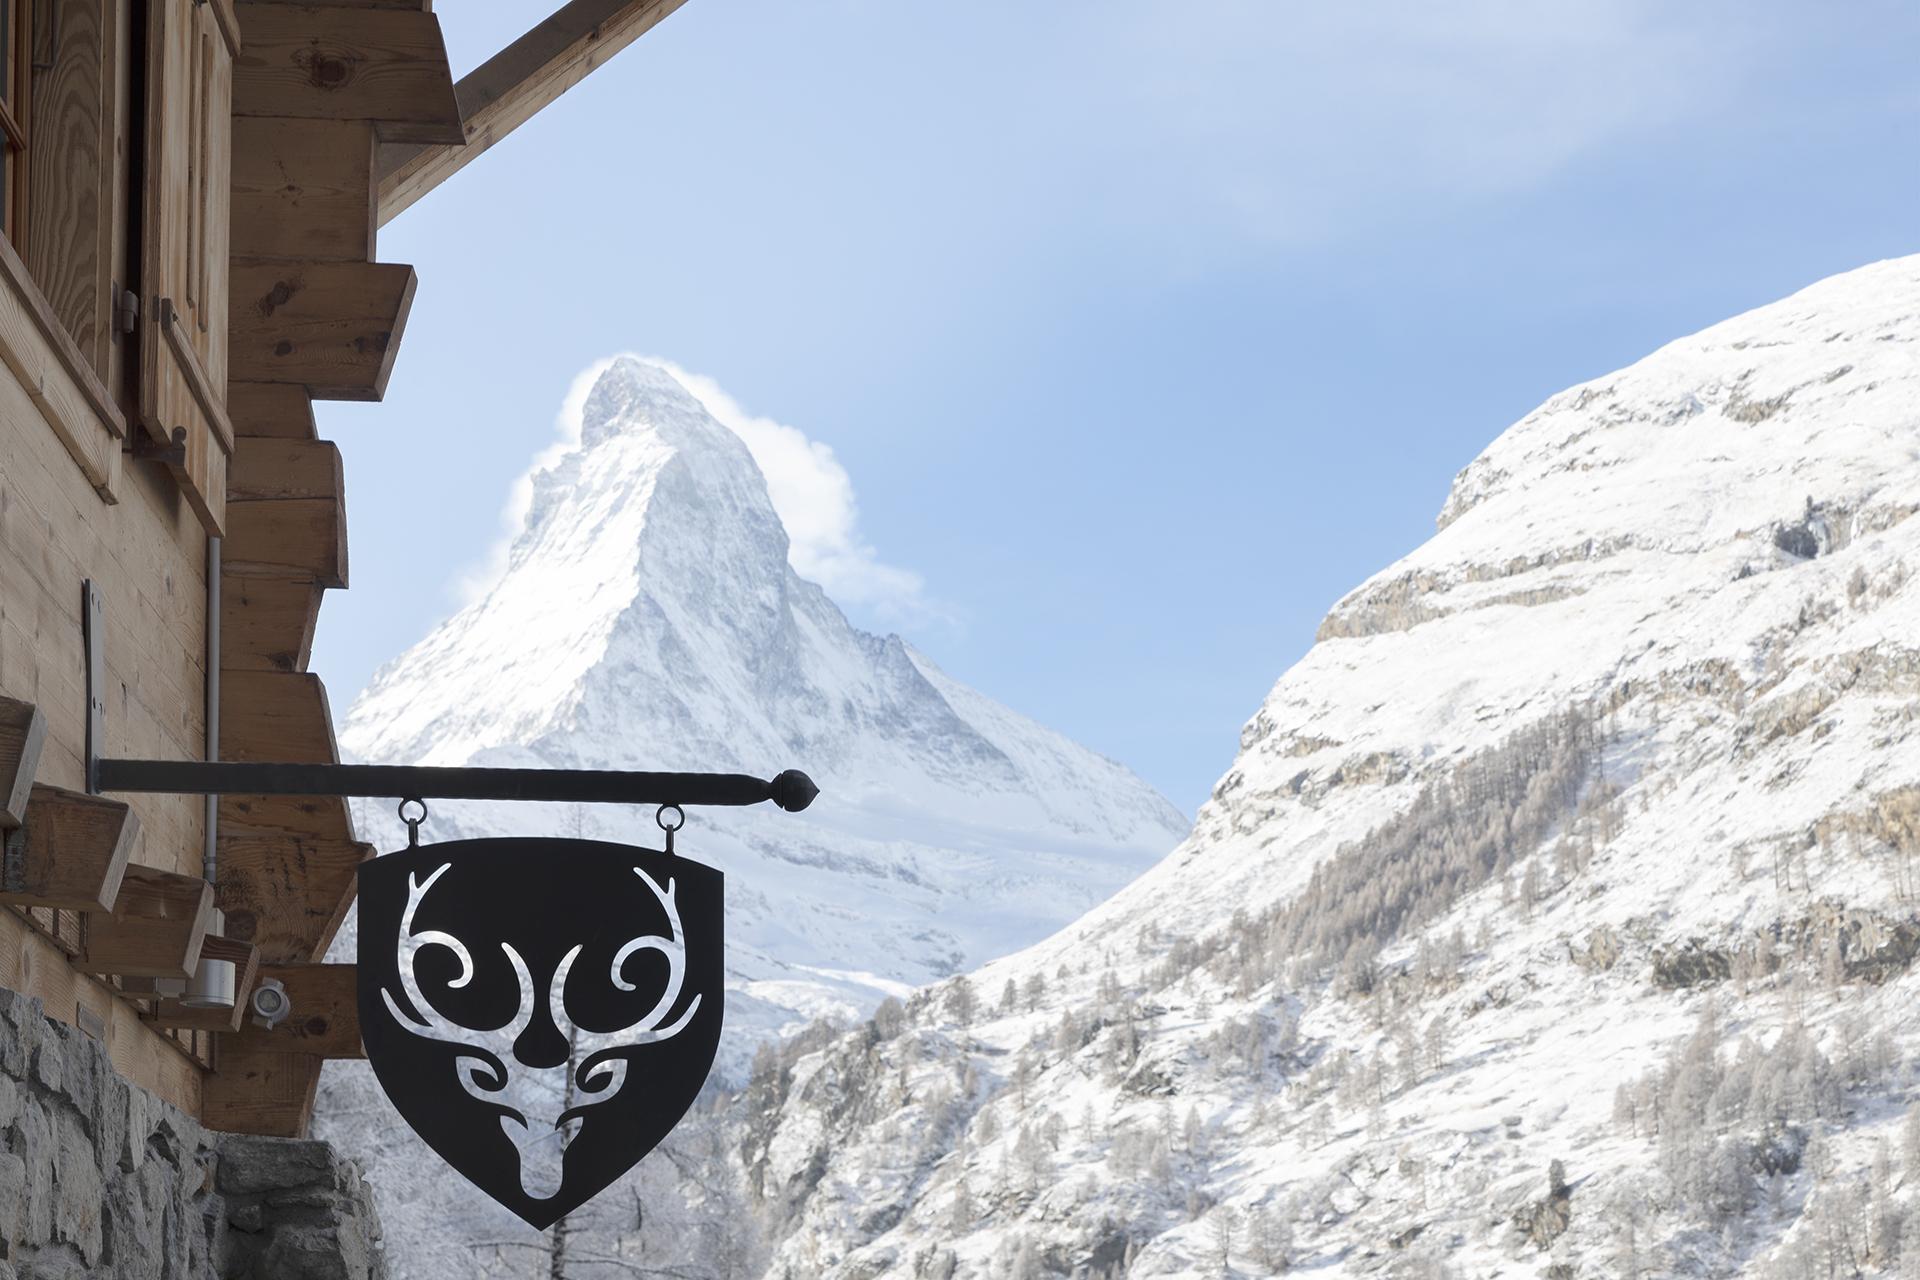 cervo mountain resort | zermatt | switzerland